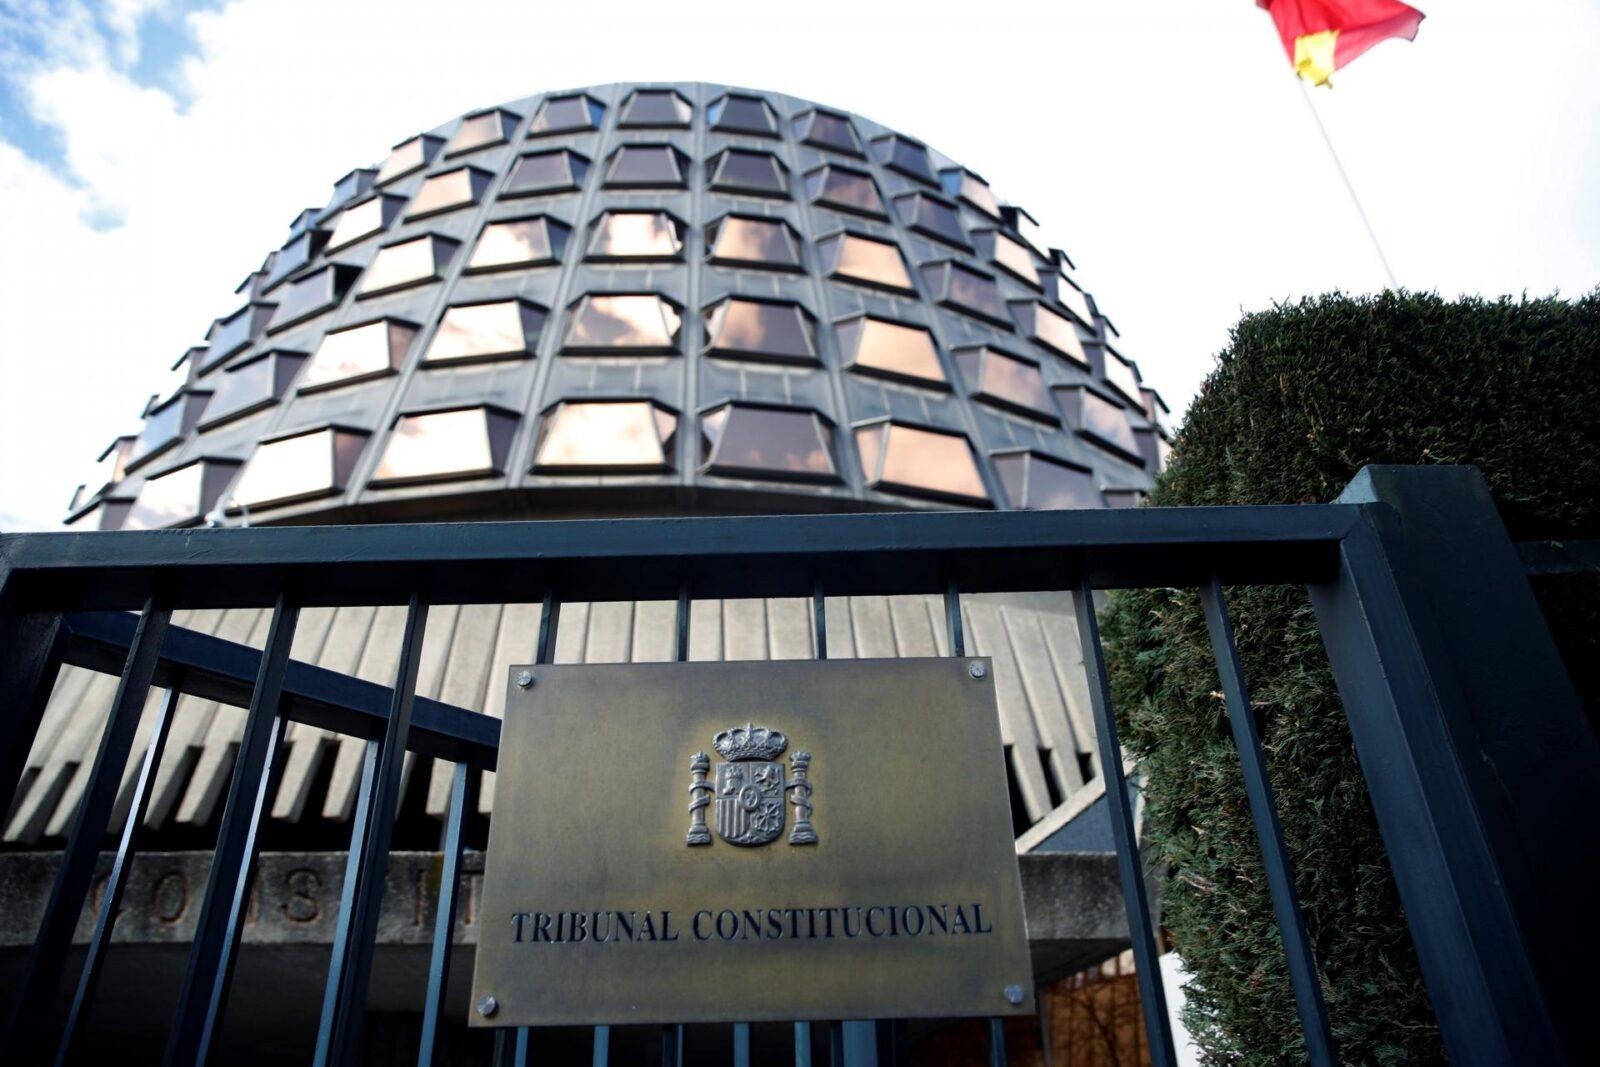 Spain's Constitutional Court